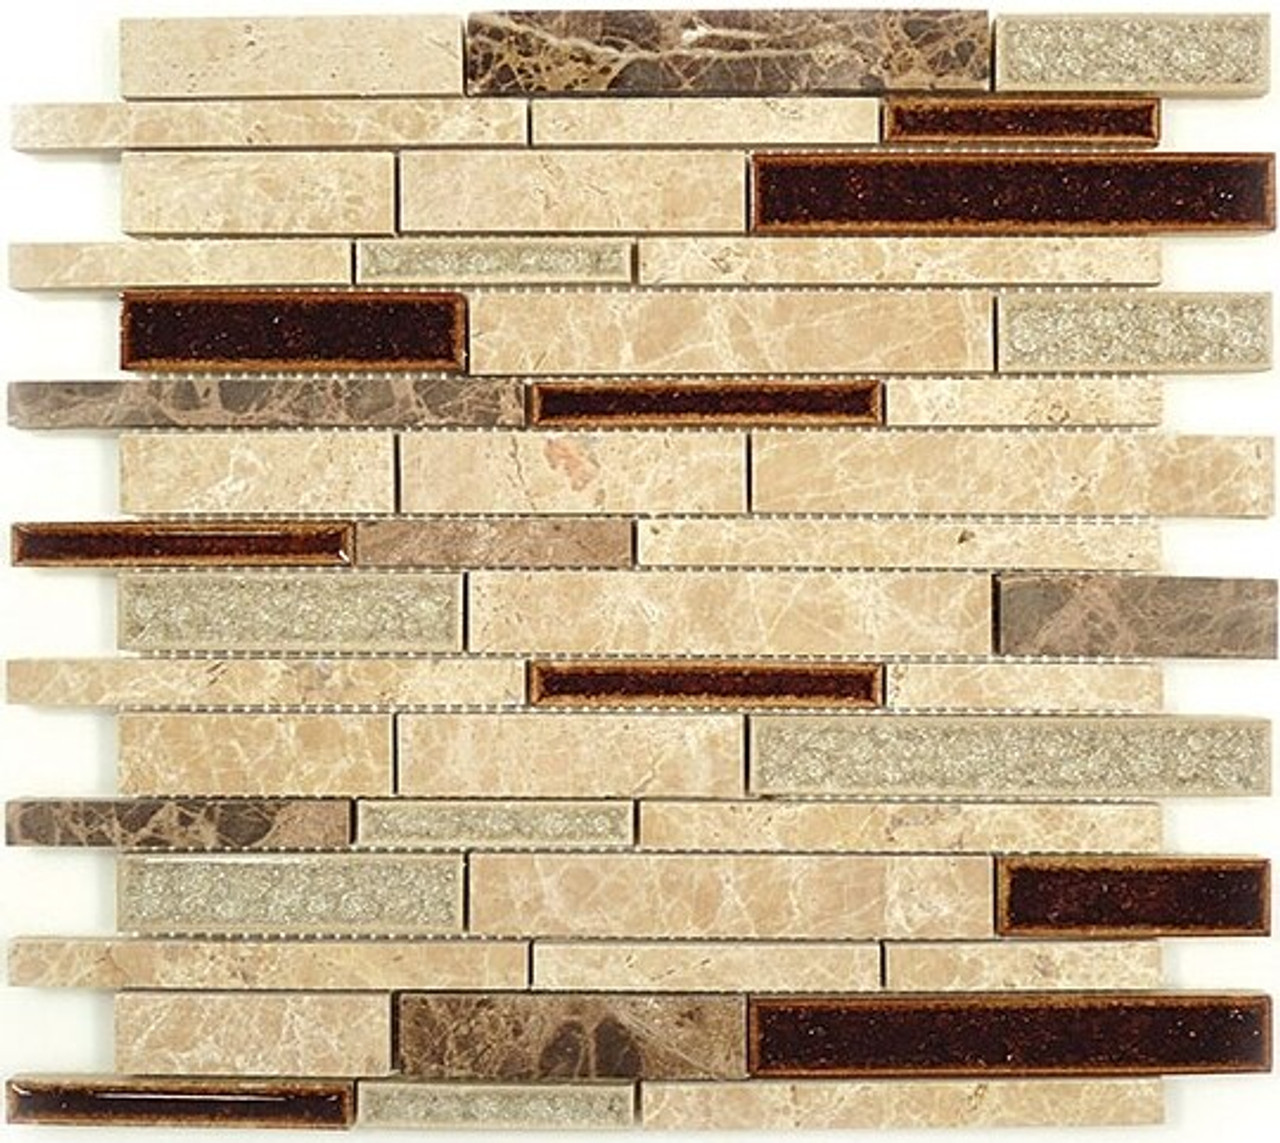 Bella Glass Tiles Tranquil Random Brick Series El Dorado